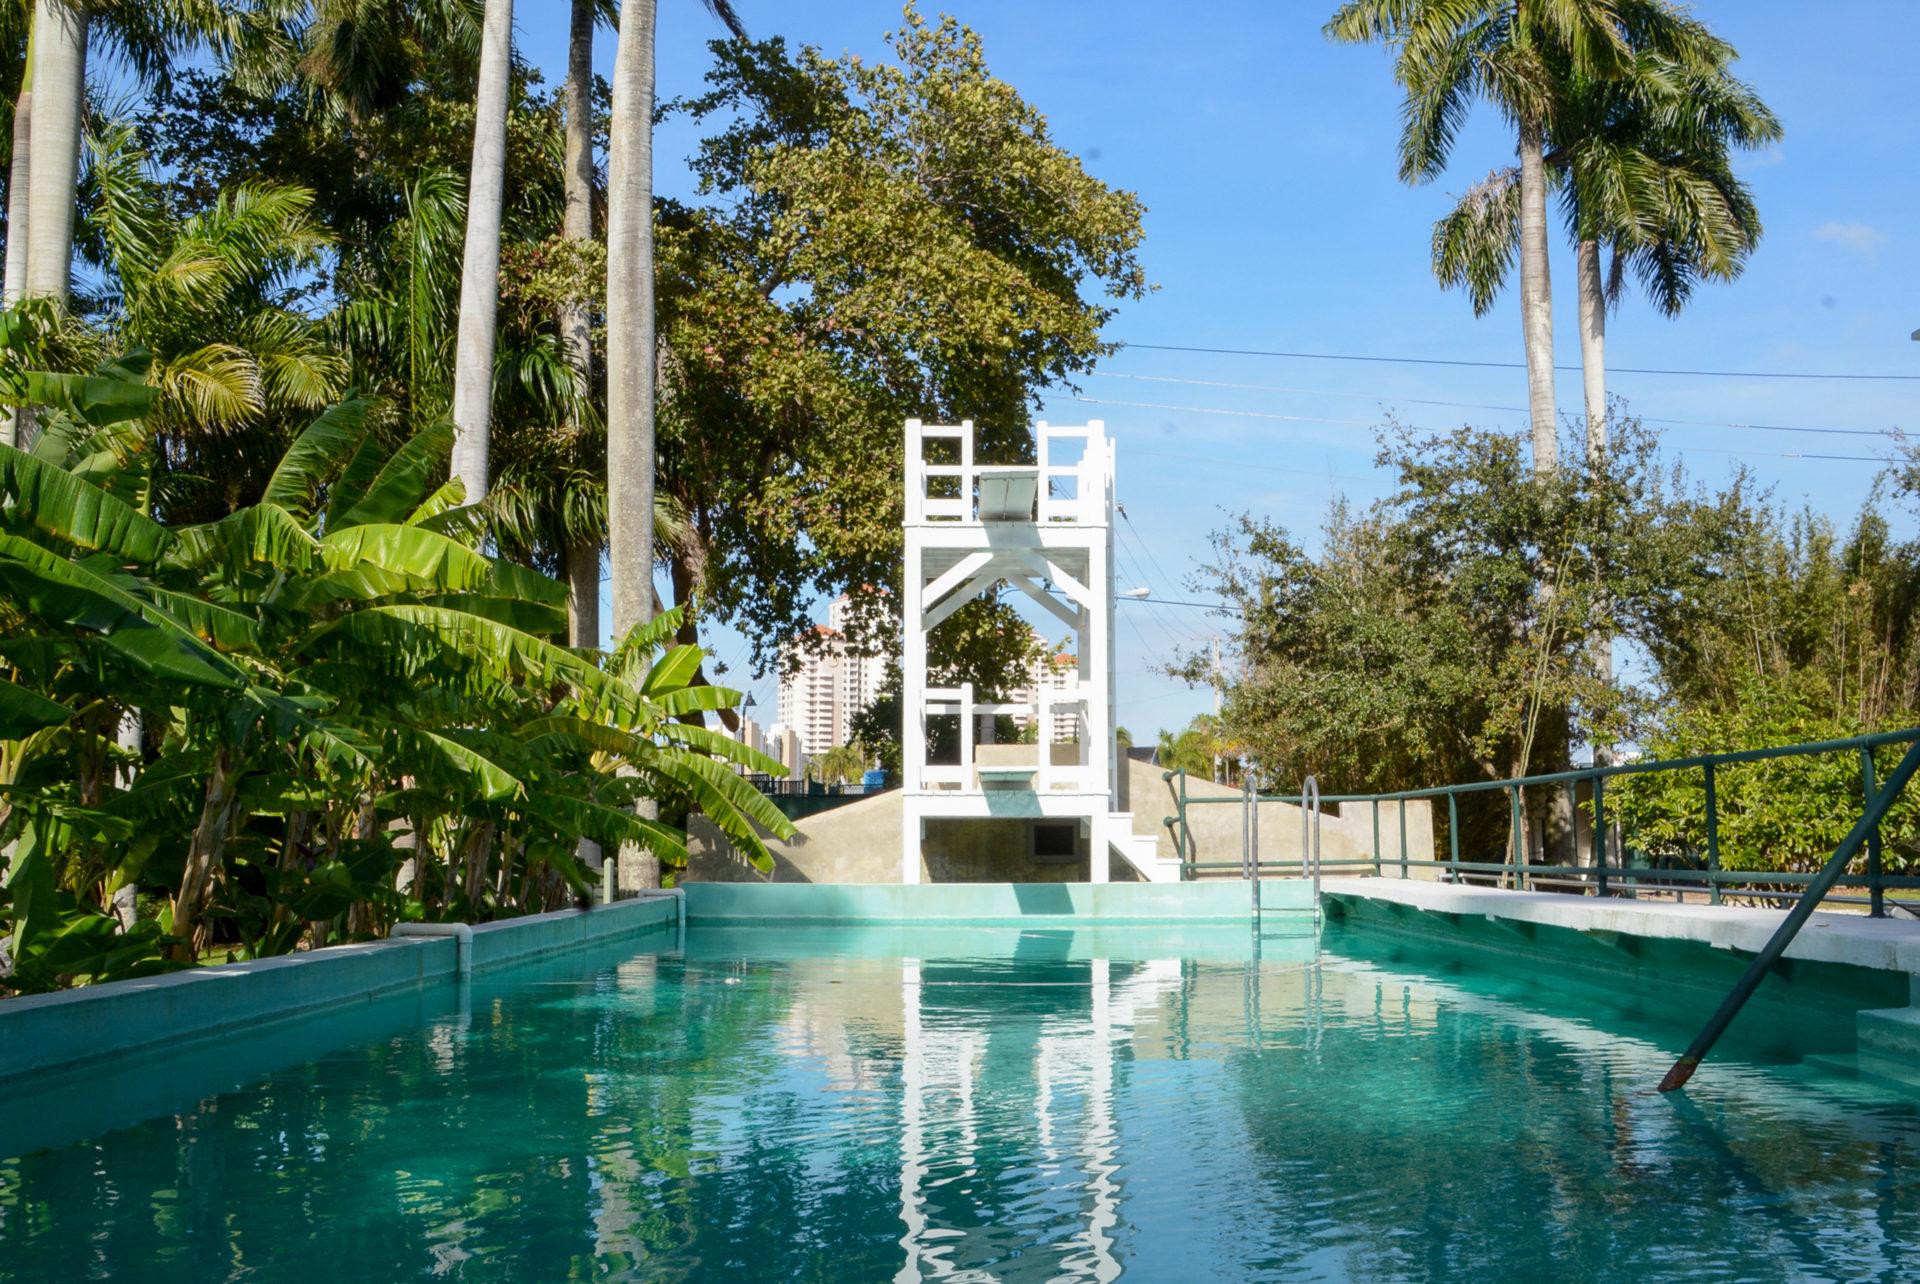 Swimming Pool von Thomas Edison auf dem Estate in Fort Myers